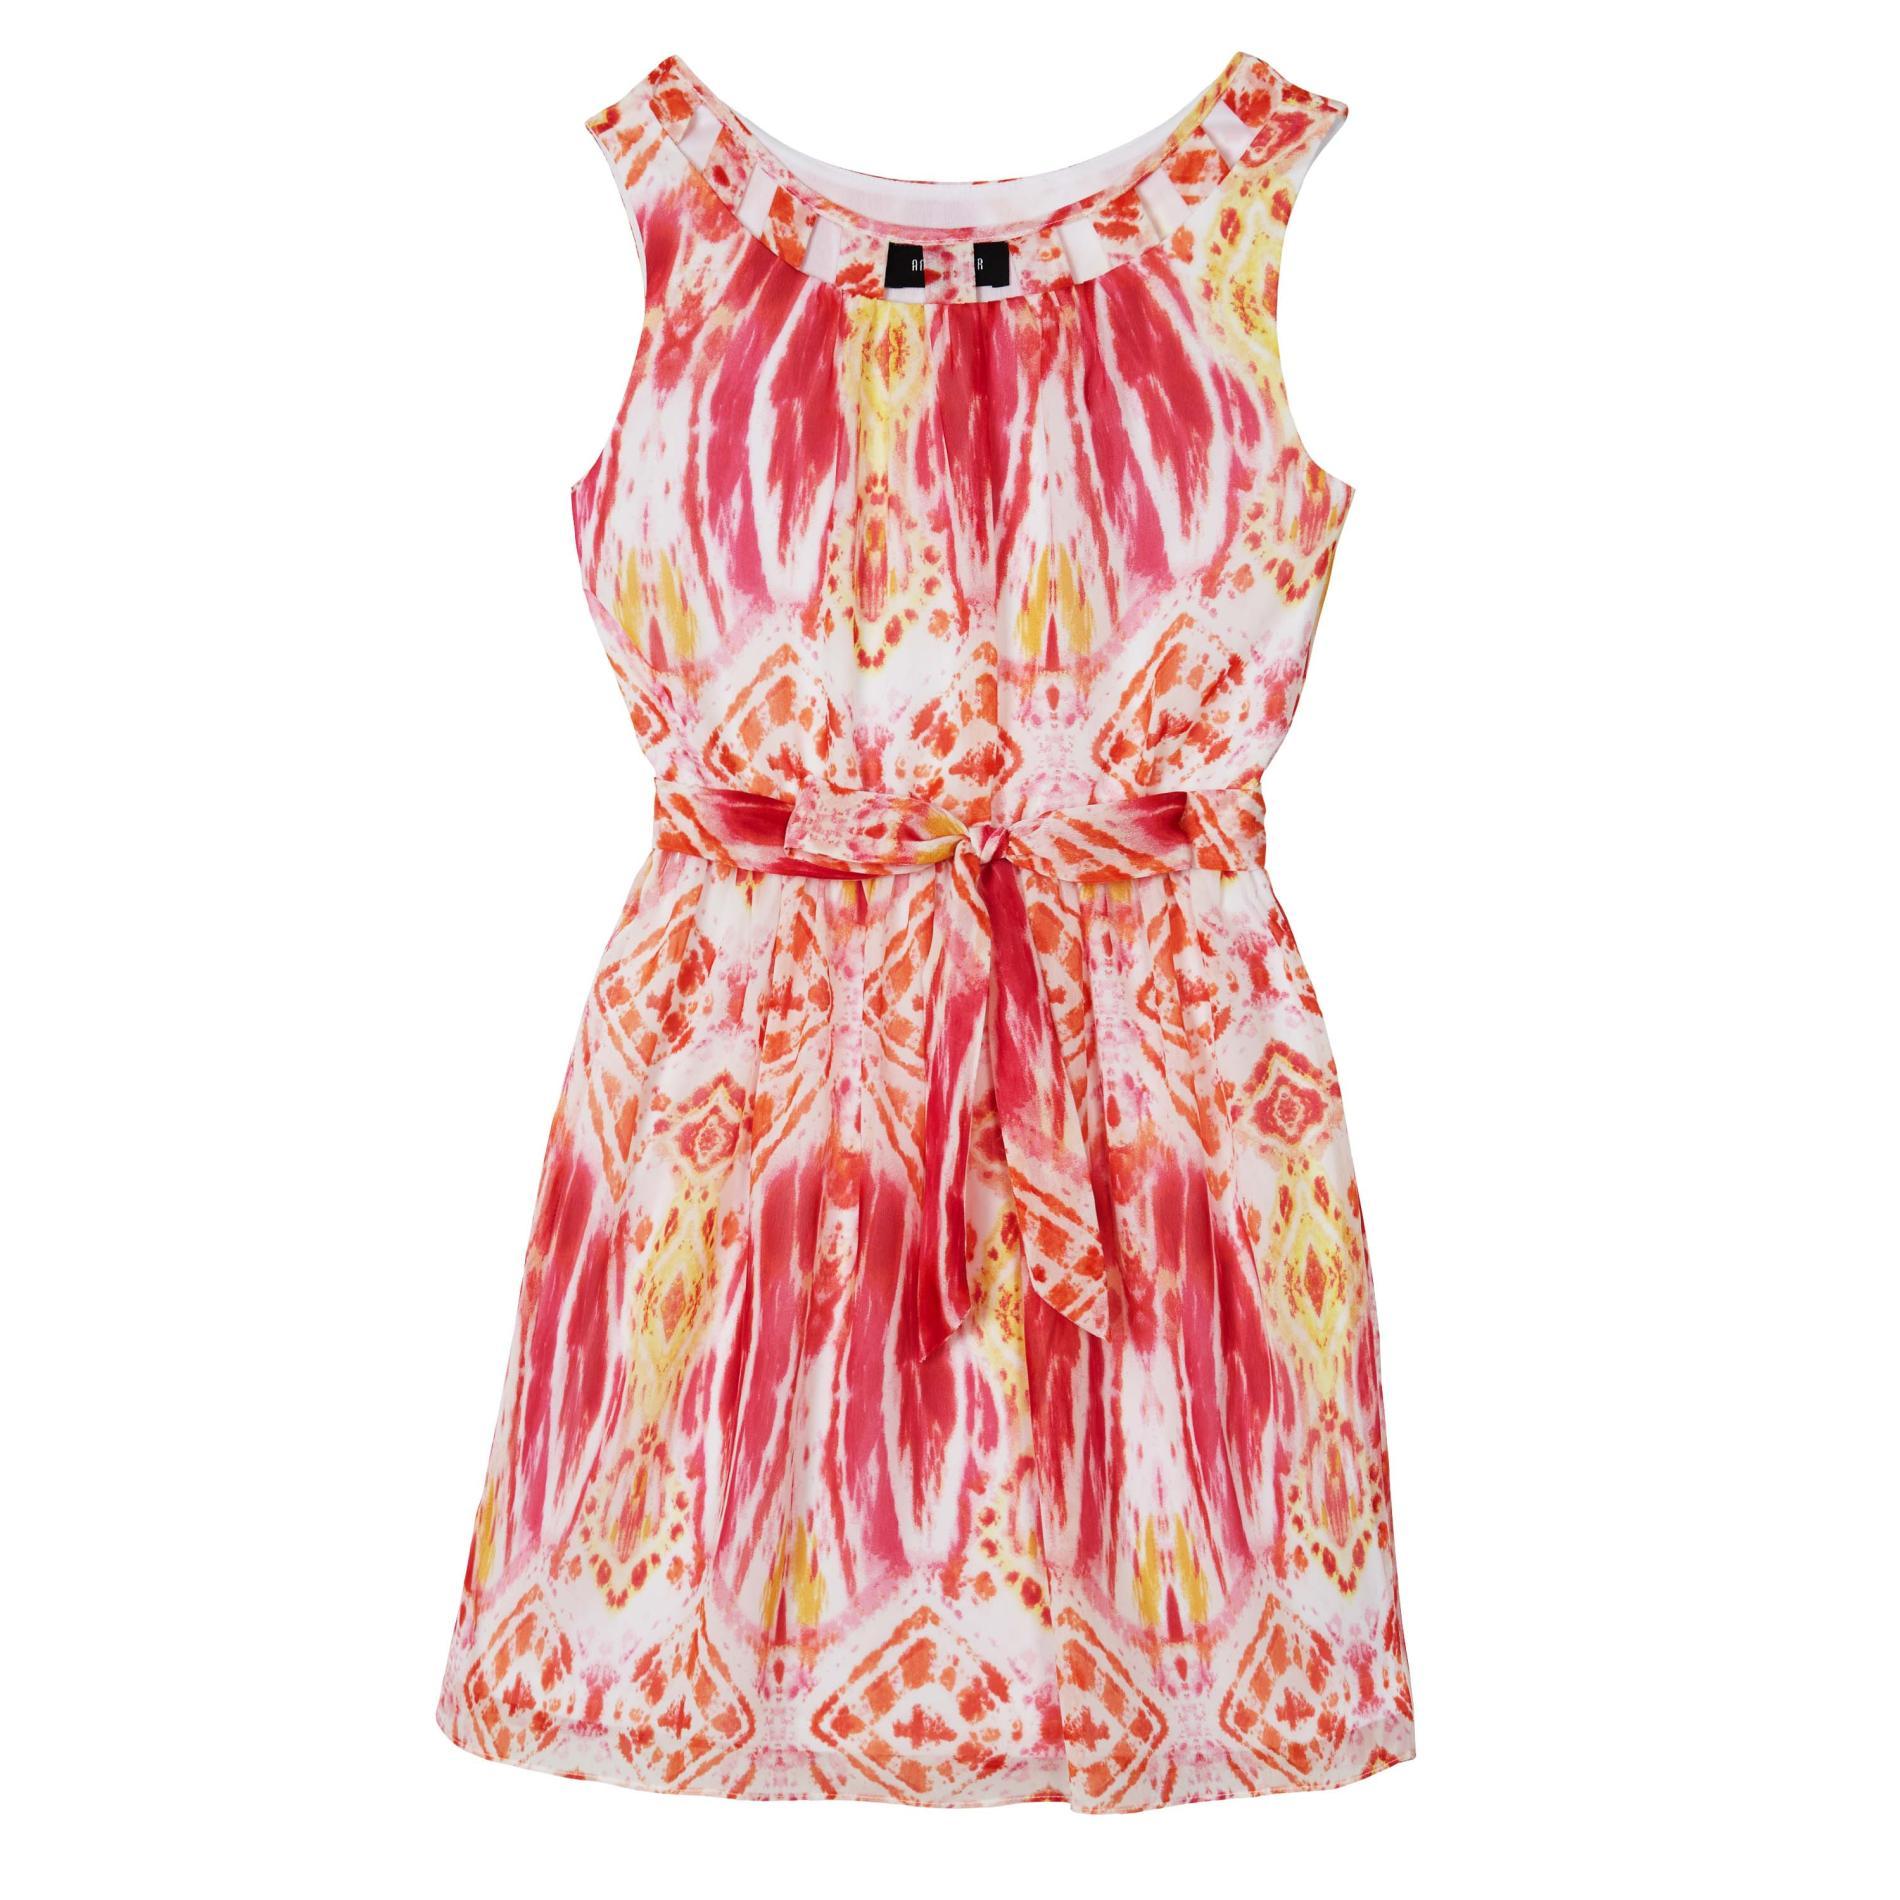 Amy's Closet Girl's Chiffon Dress & Belt - Batik Print